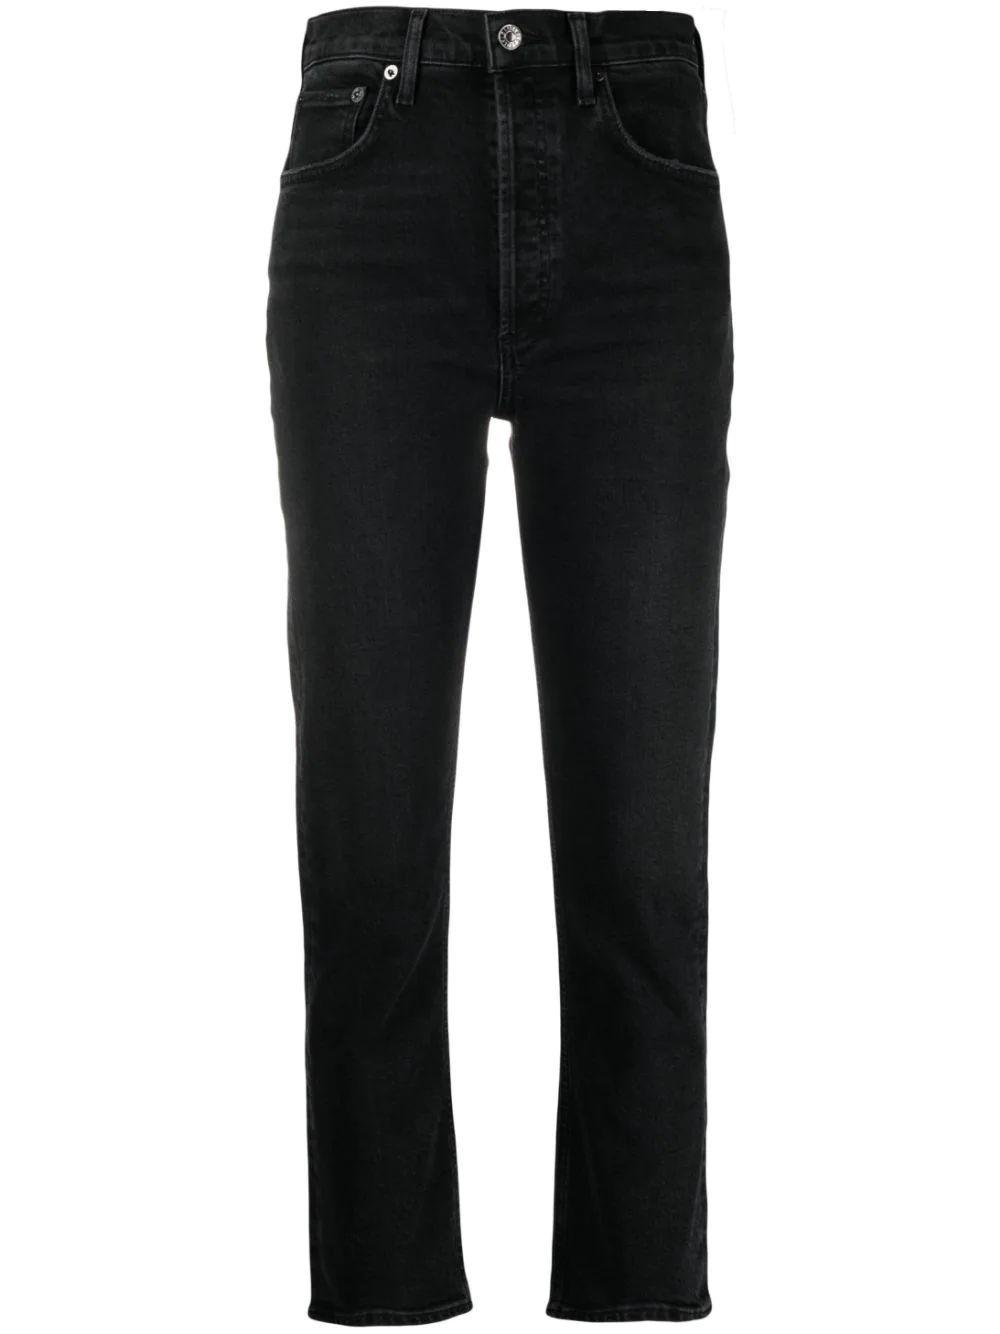 Riley Straight Leg Cropped Jean Item # A056-1286